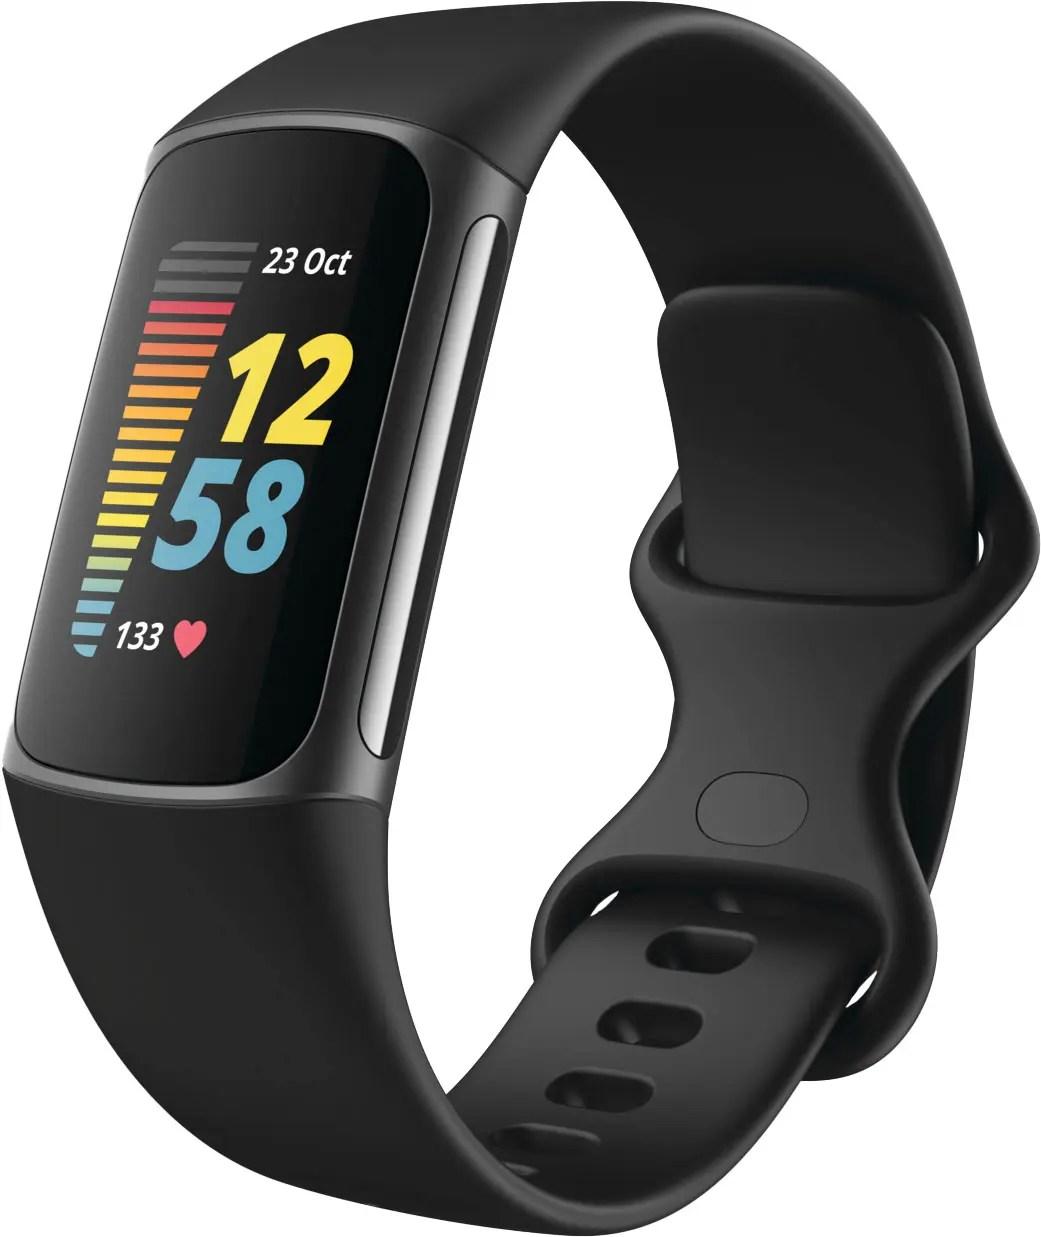 Fitbit Charge 5 Renderings